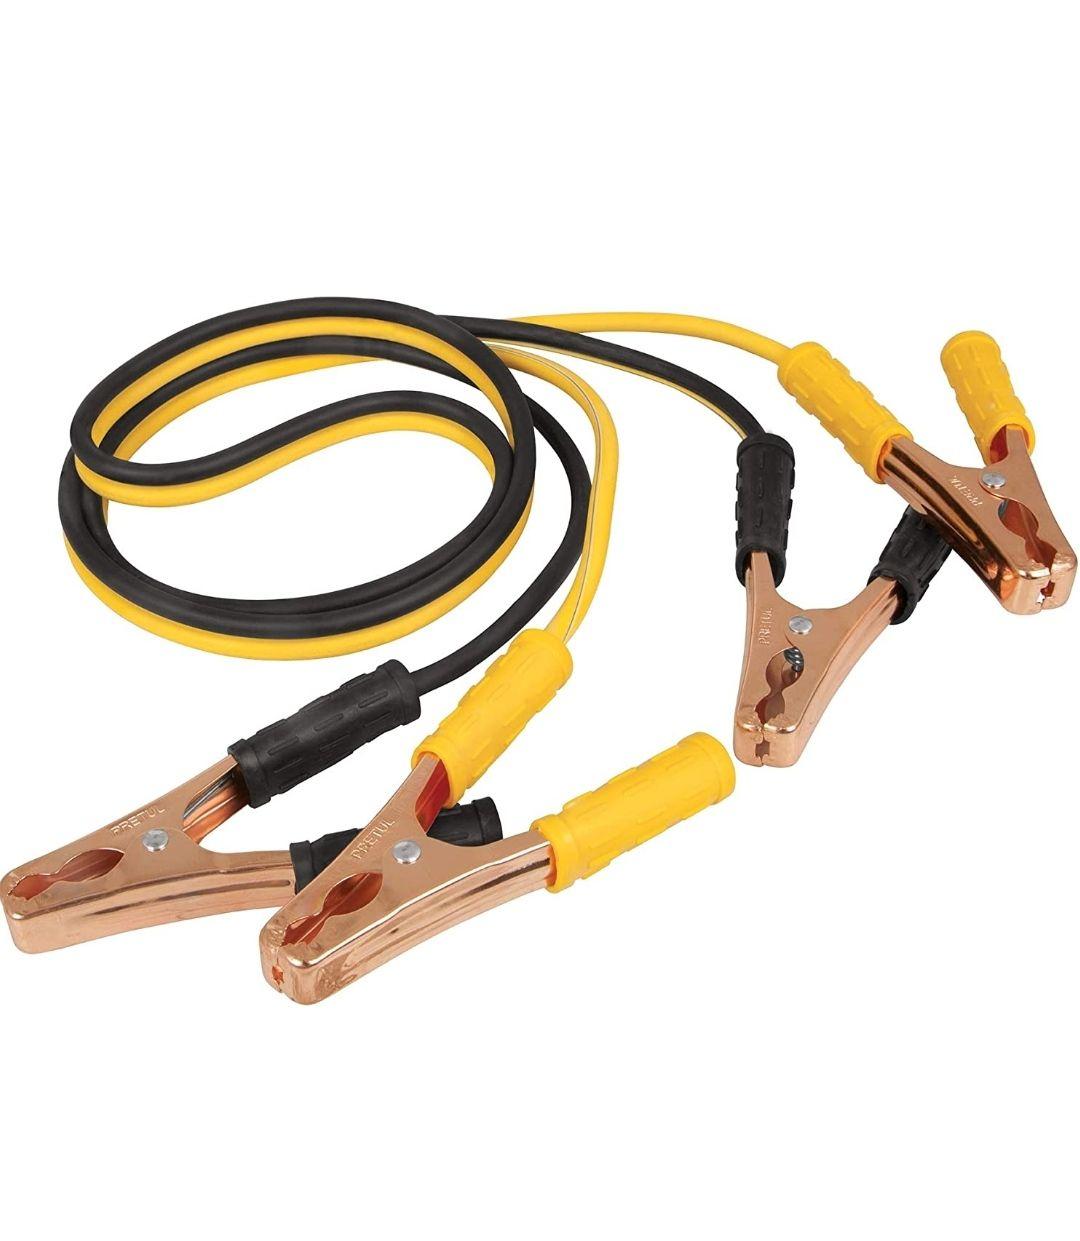 Amazon:Pretul CAP-2010P, Cables pasa corriente, calibre 10